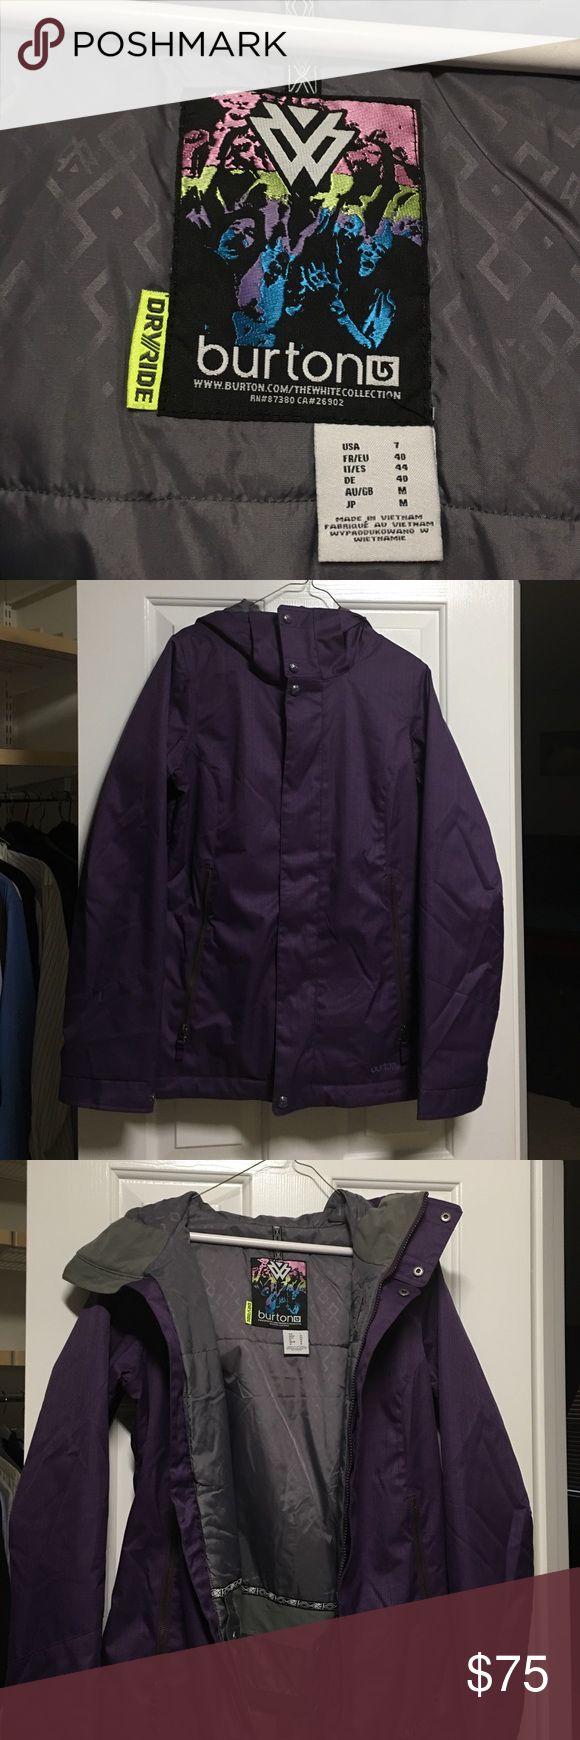 Women's Burton Ski Jacket - Purple Cool deep Purple Burton Jacket.  Worn twice (moved to south, don't use now).  Perfect shape!  Size 7.  Two front pockets.  Very Warm.! Smoke free home. Burton Jackets & Coats